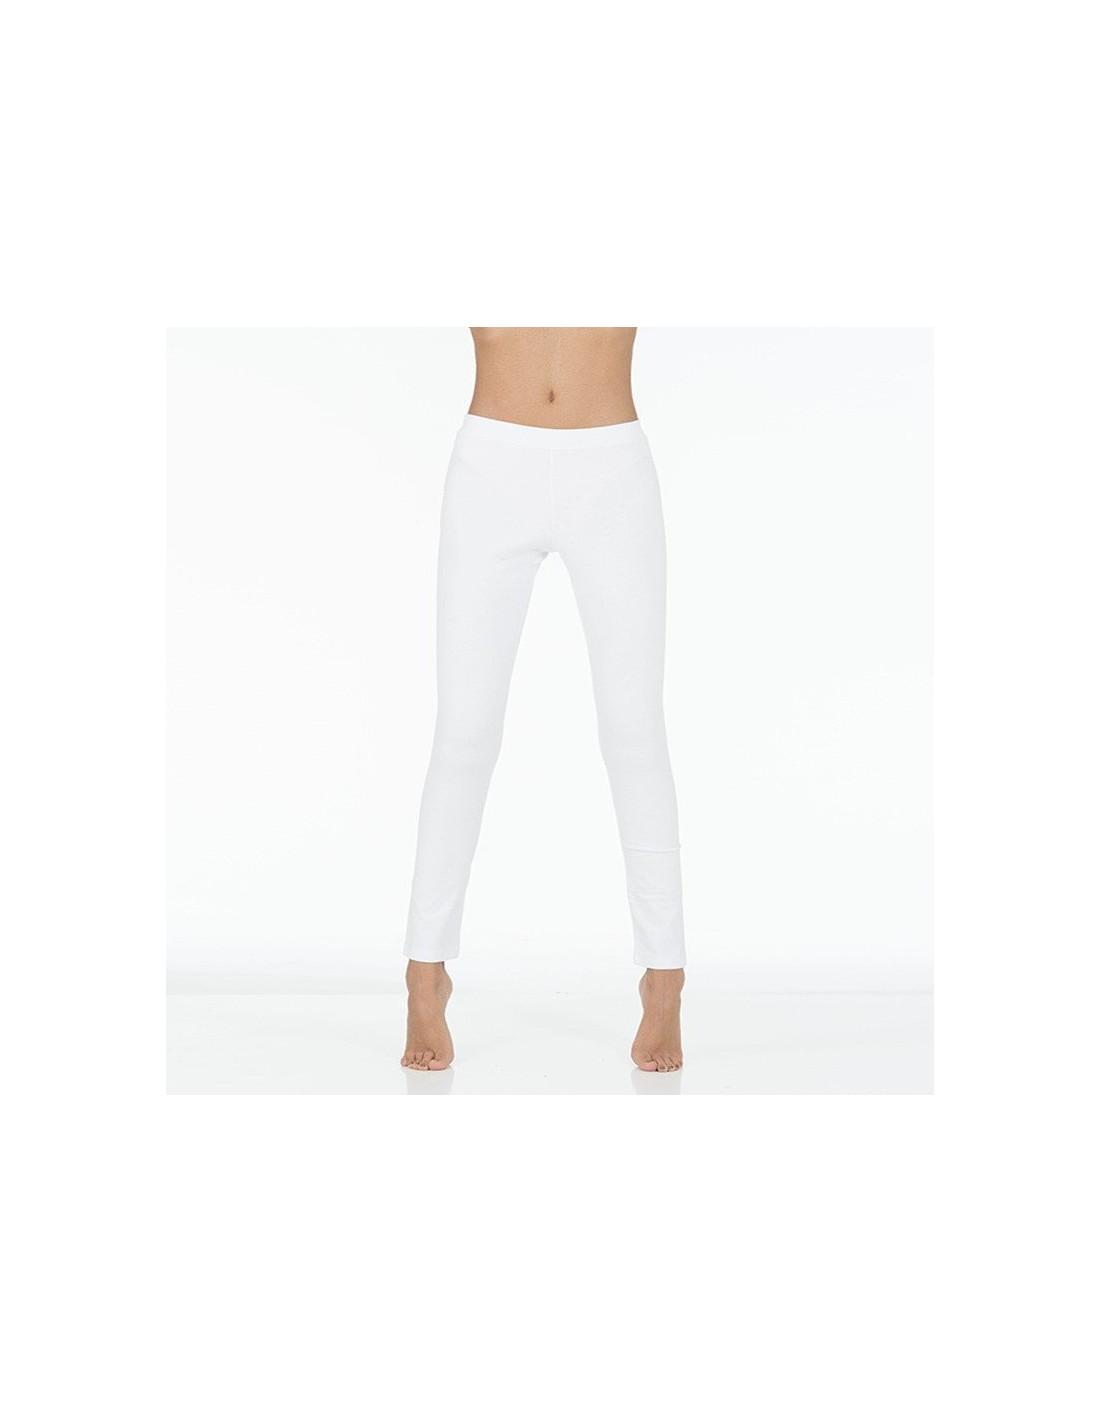 design senza tempo 7fd18 59fd2 Yoga leggings bianchi lunghi | YogaEssential - Made in Italy